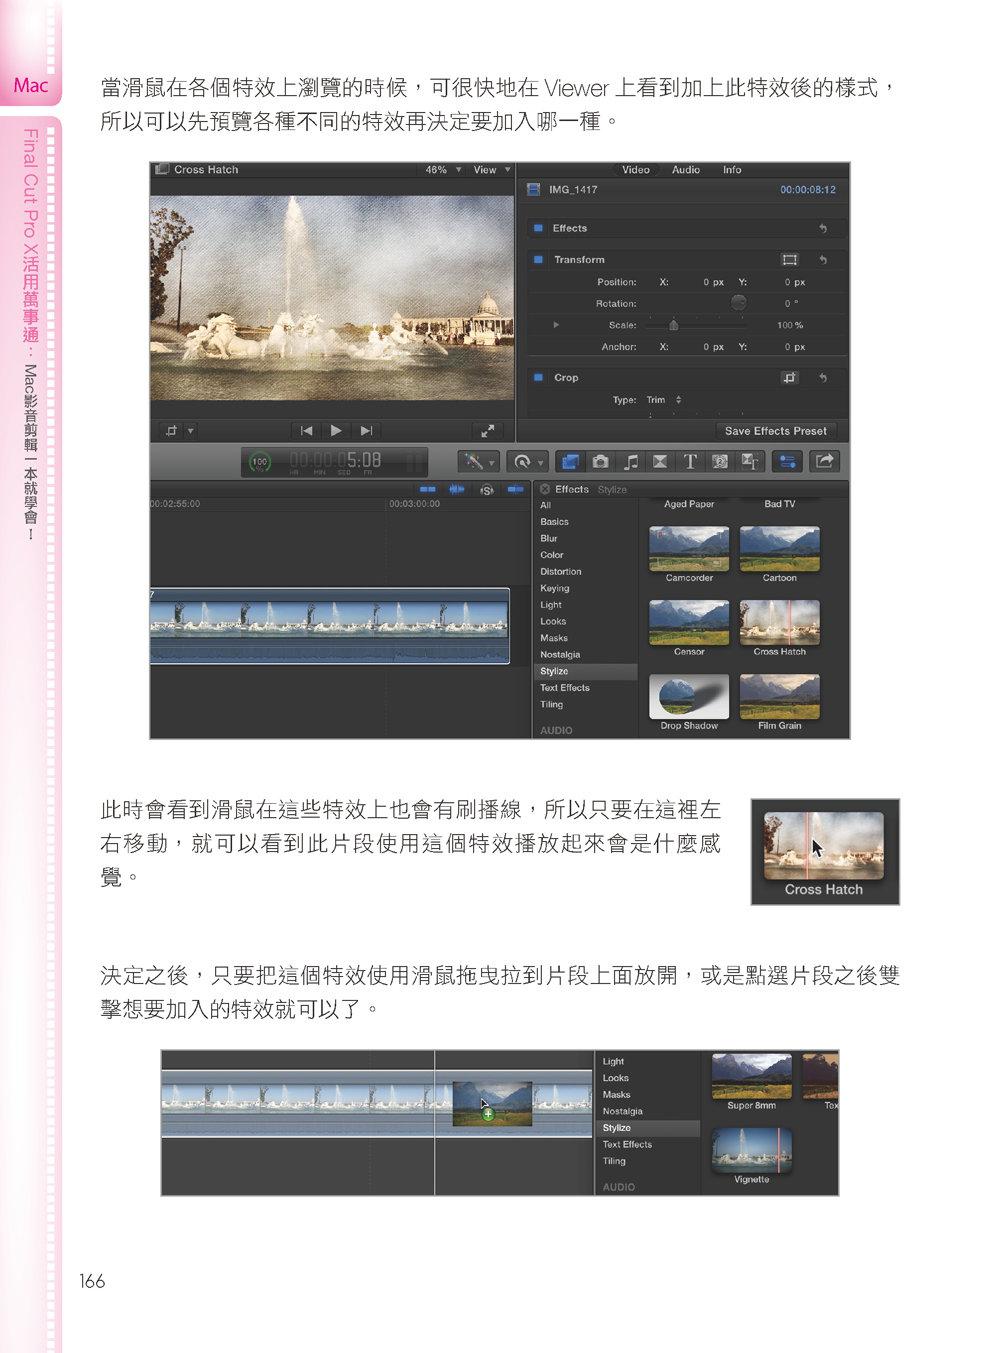 Final Cut Pro X 活用萬事通:Mac 影音剪輯一本就學會!(暢銷回饋版)-preview-14